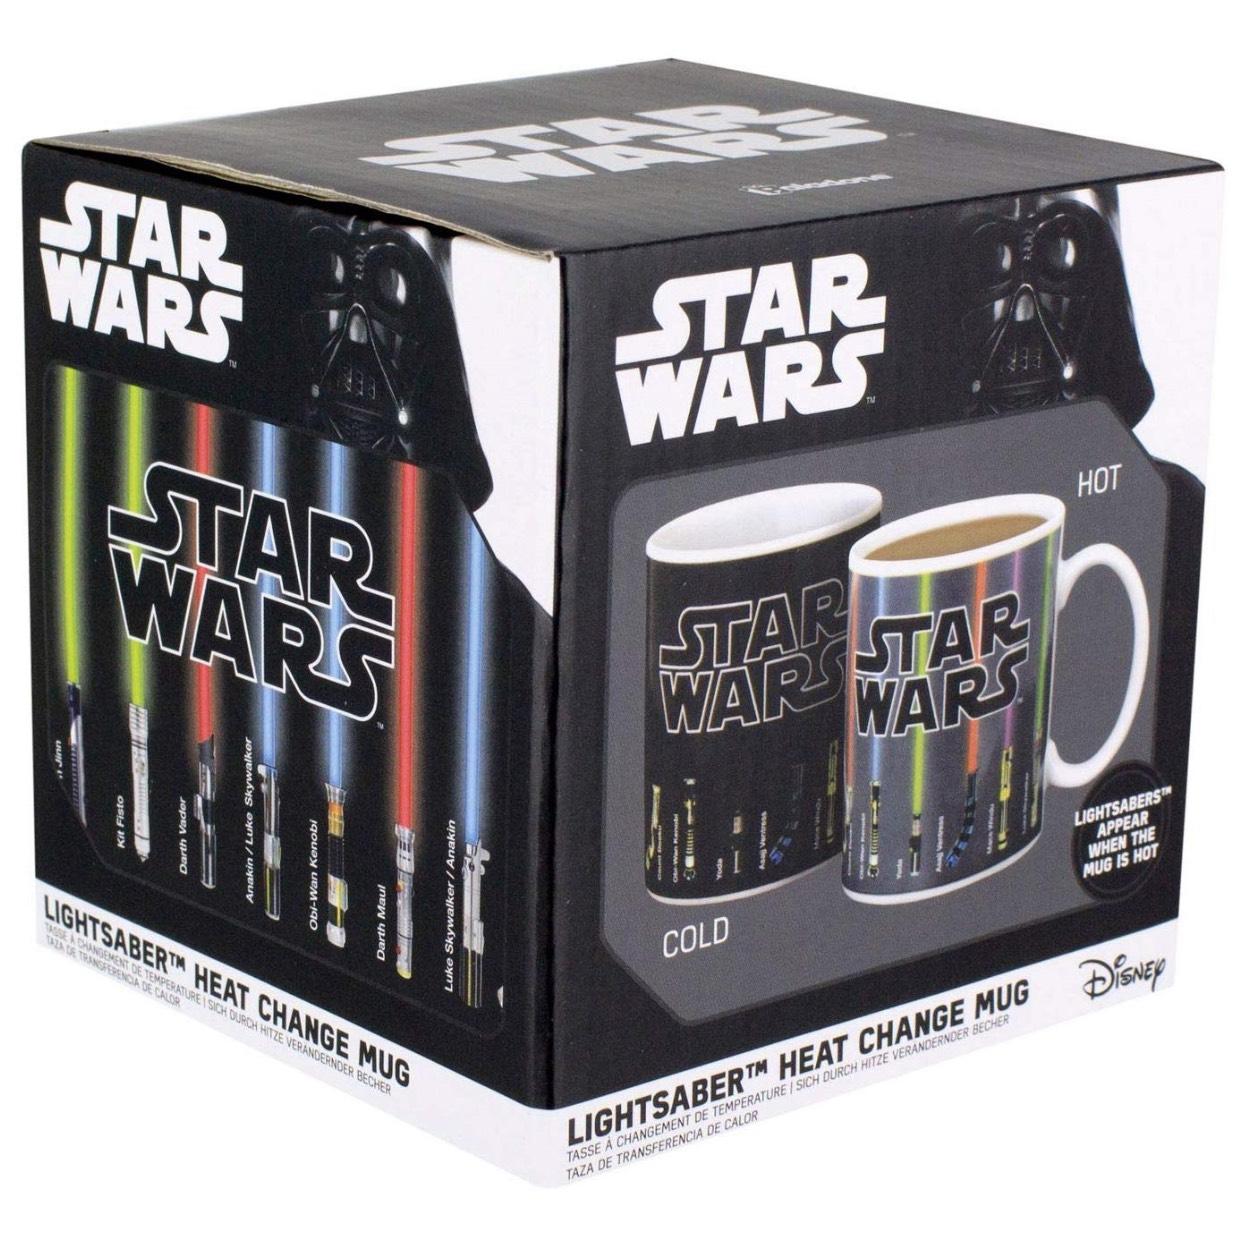 Star Wars Lightsaber Heat Change Mug, Porcelain Multi 10.5 x 10 x 10.5 cm @ Amazon £3 Prime £7.49 Non Prime